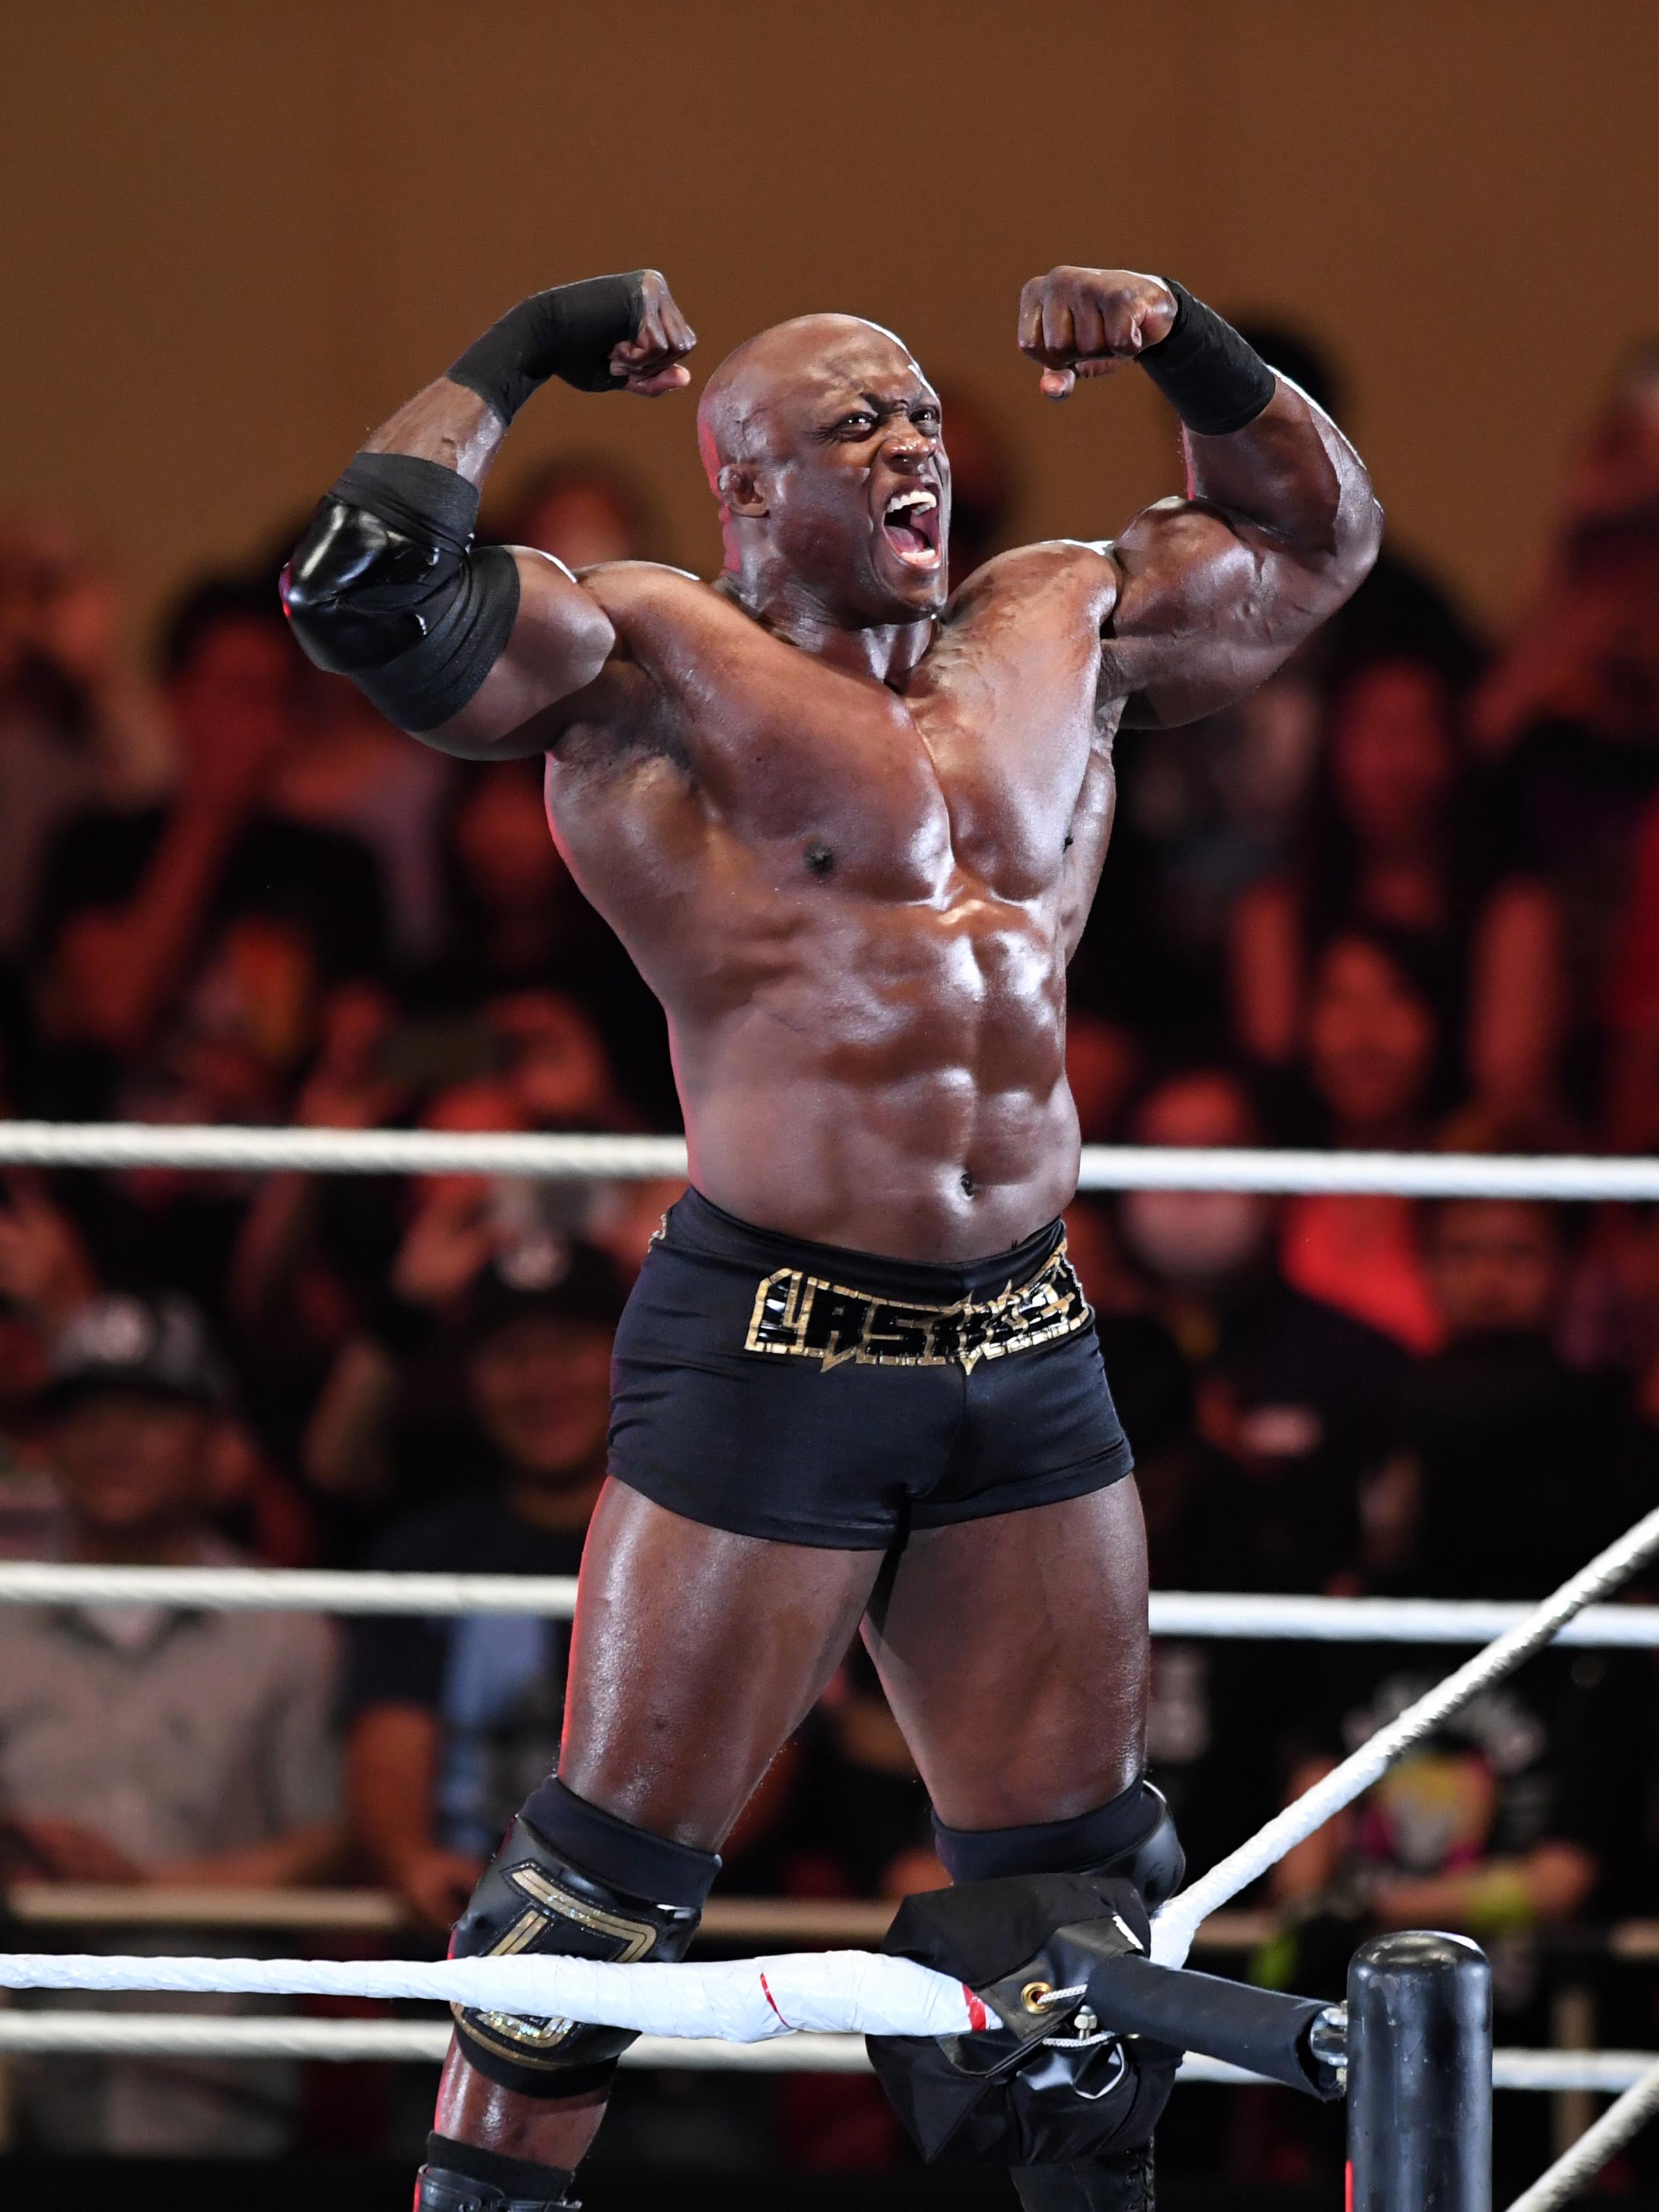 Bobby Lashley enters the ring during the WWE Live Tokyo at Ryogoku Kokugikan on June 29, 2019 in Tokyo, Japan.